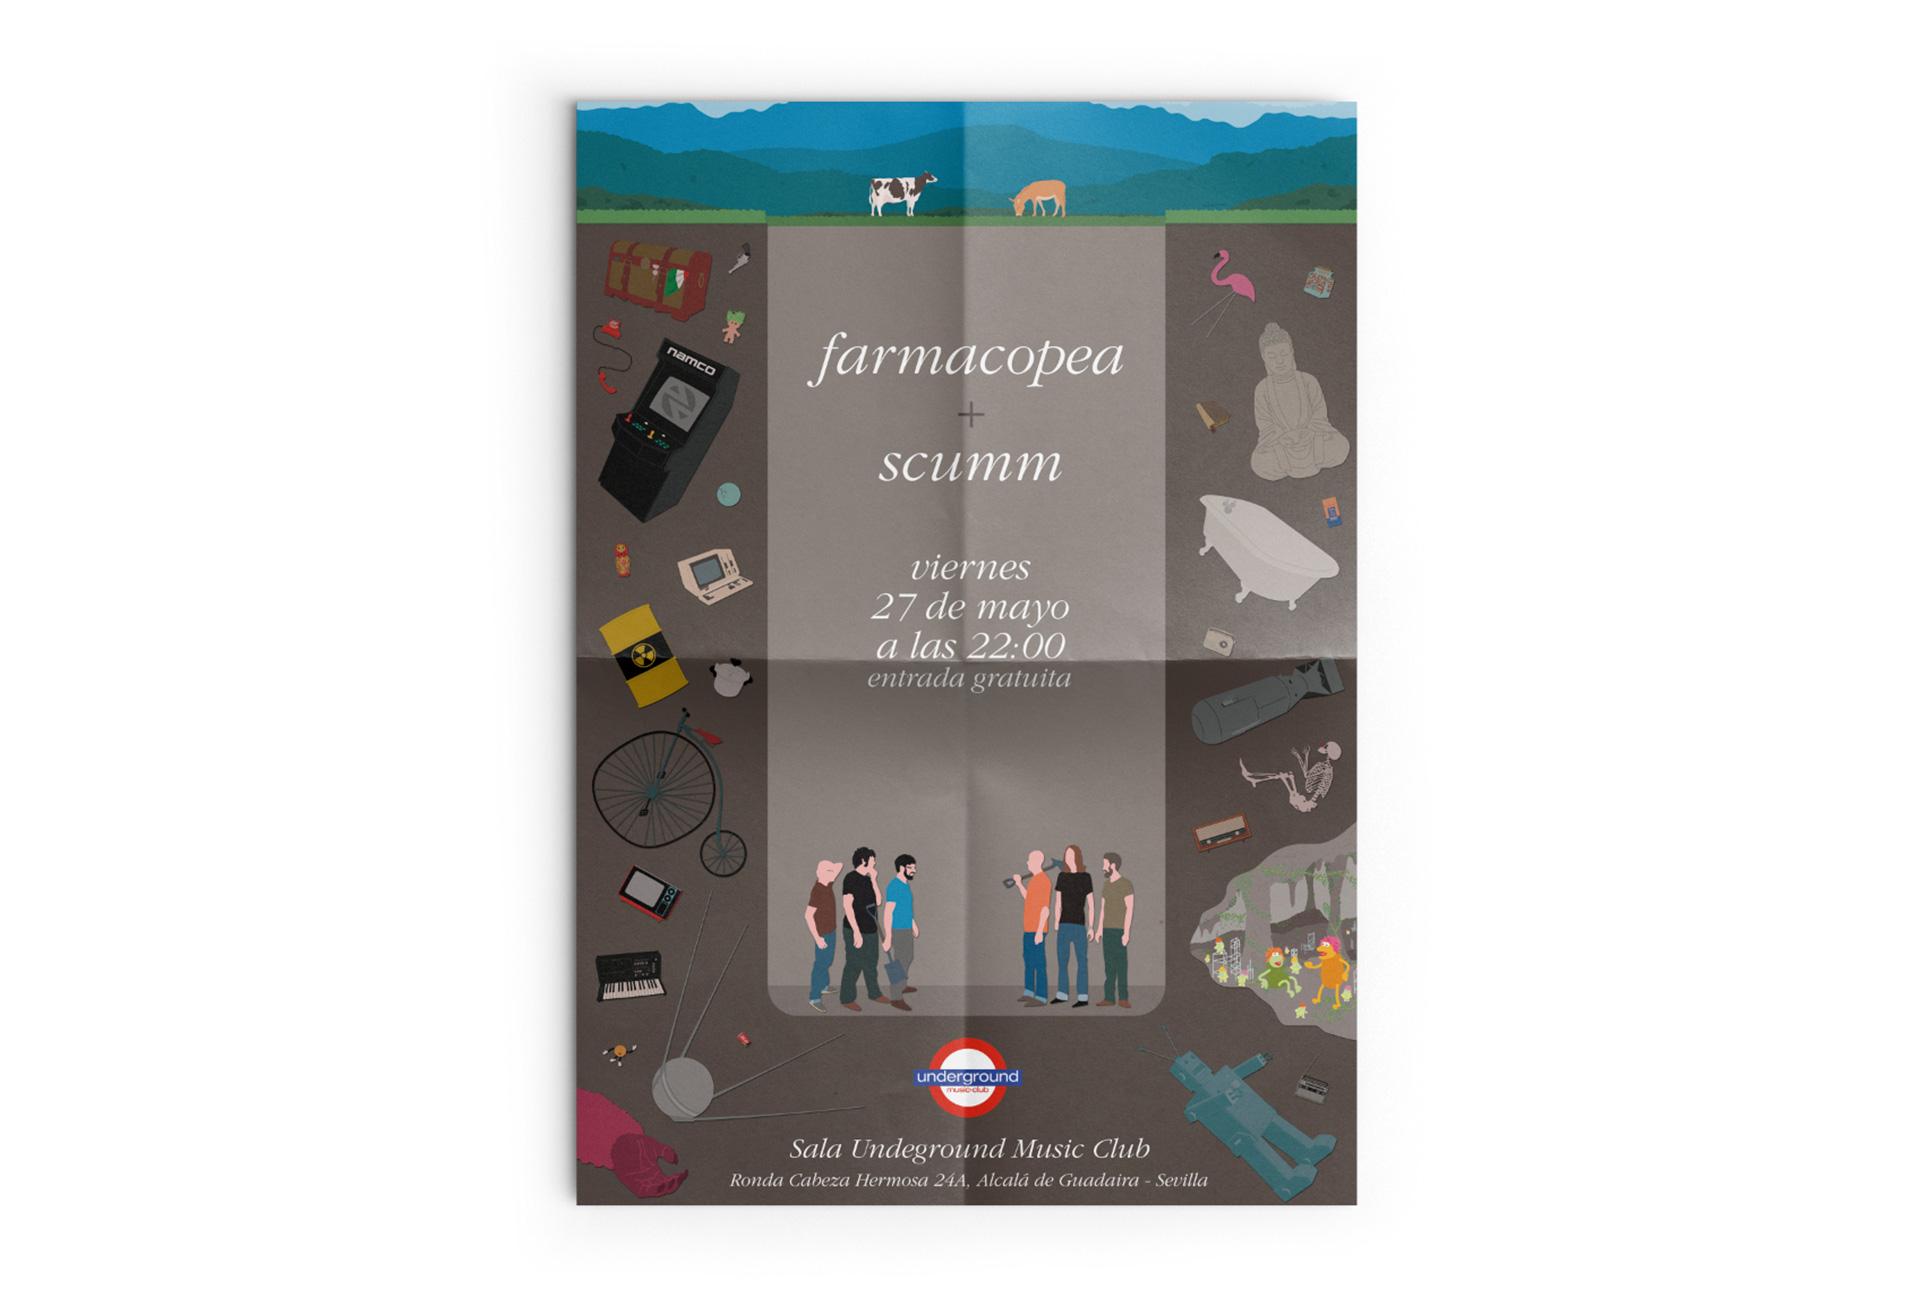 Scumm - Paracaídas fatales - póster farmacopea concierto